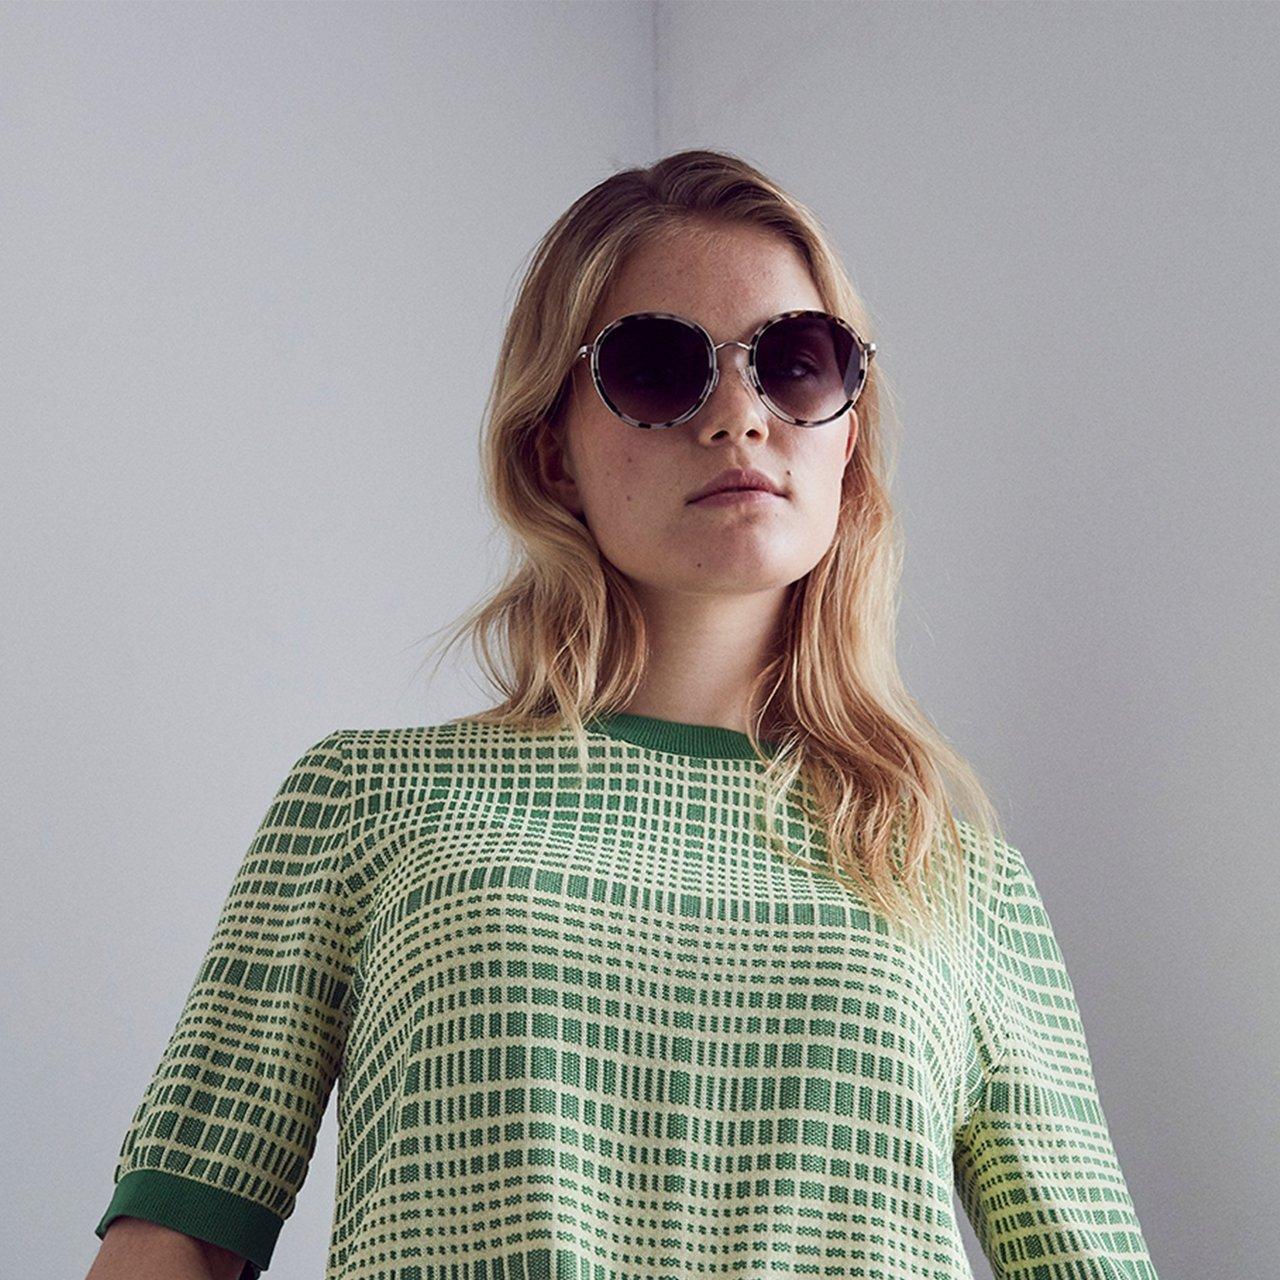 Corcovado Cheetah Sunglasses